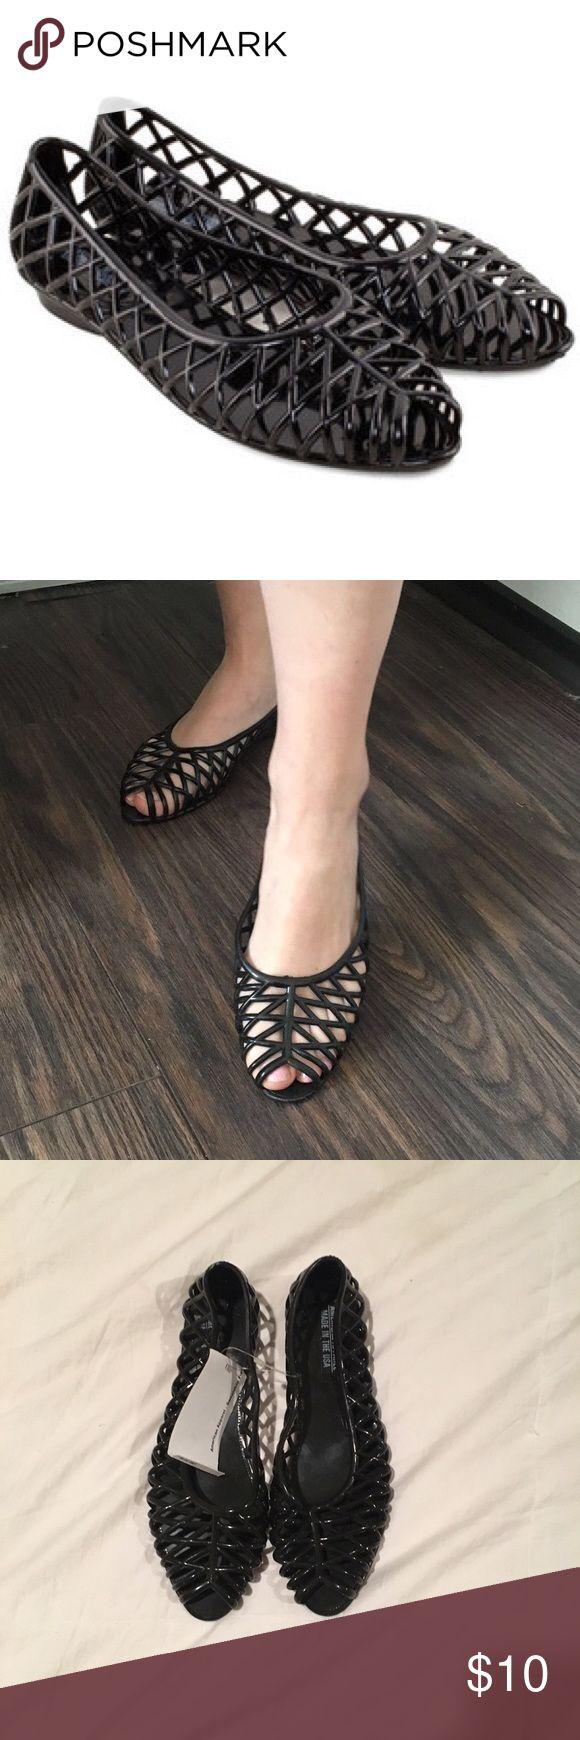 Black jelly sandals american apparel - Black Jelly Shoes Sandals American Apparel Black Jelly Shoes Super Cute Nwt